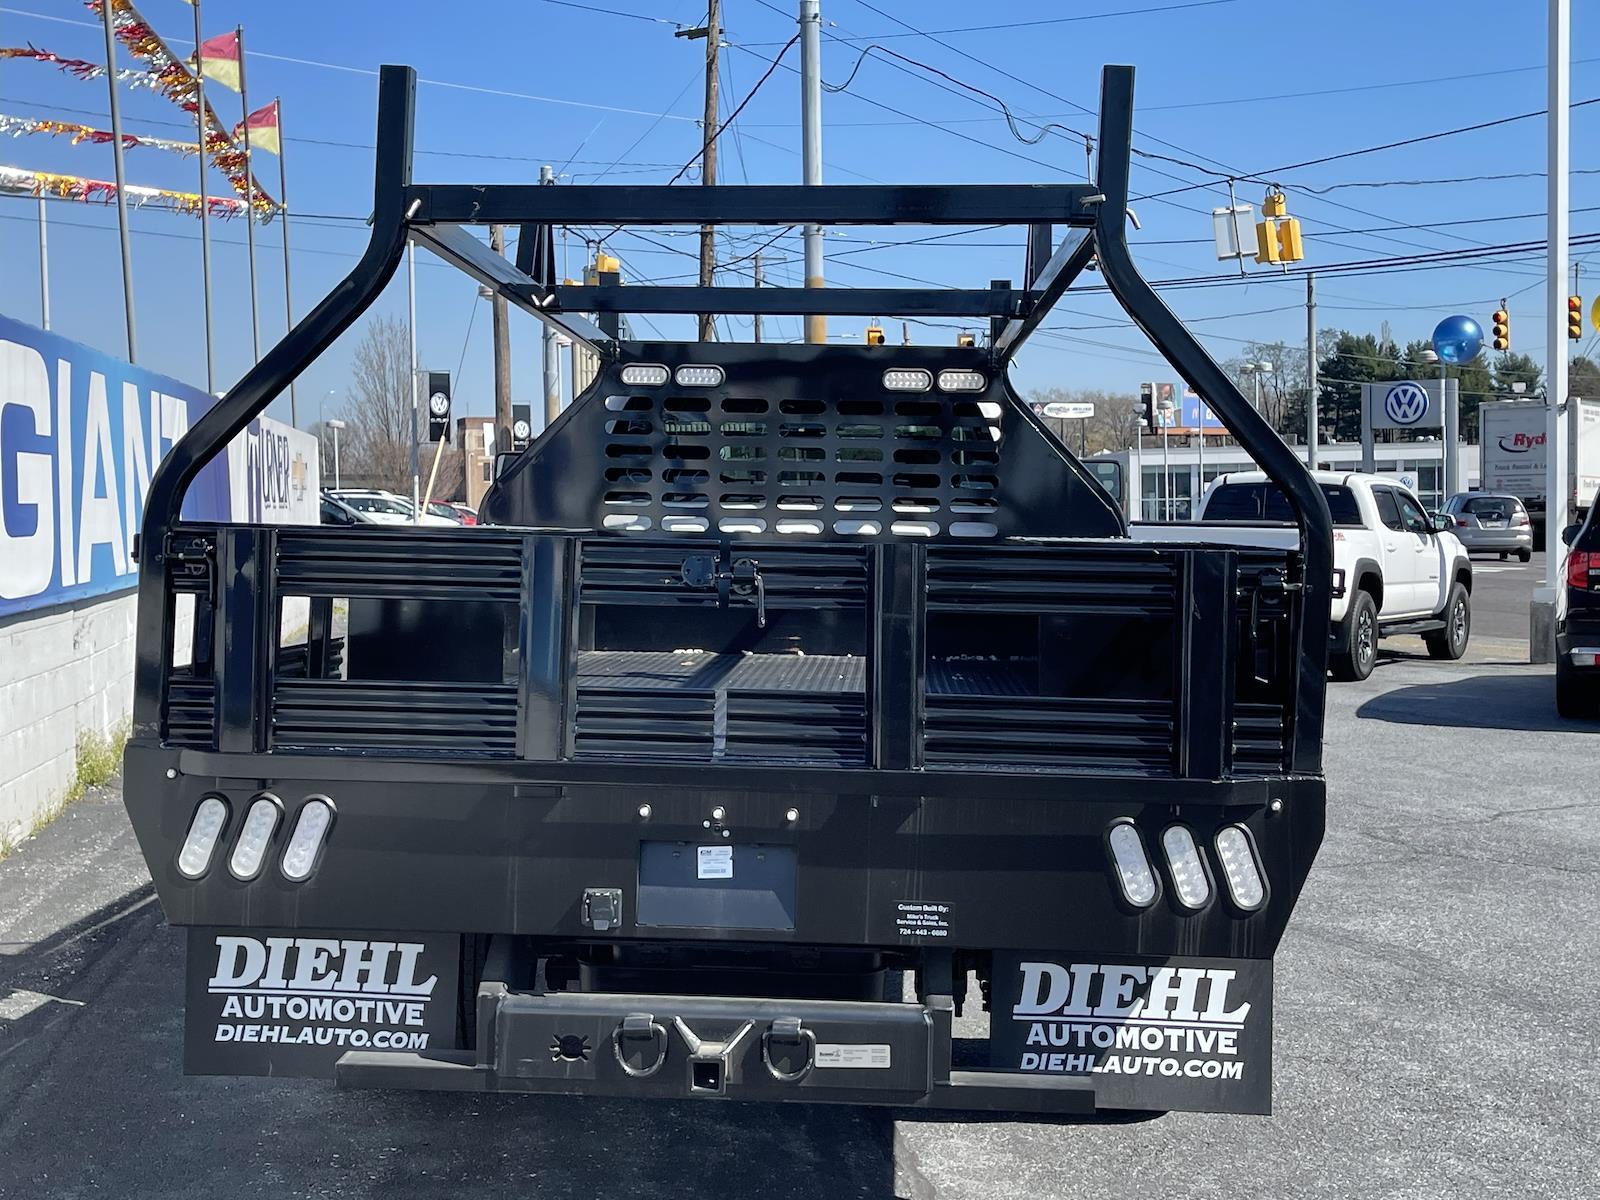 2020 Chevrolet Silverado 4500 Regular Cab DRW 4x2, Mike's Truck Service and Sales Inc. Contractor Body #205978 - photo 7